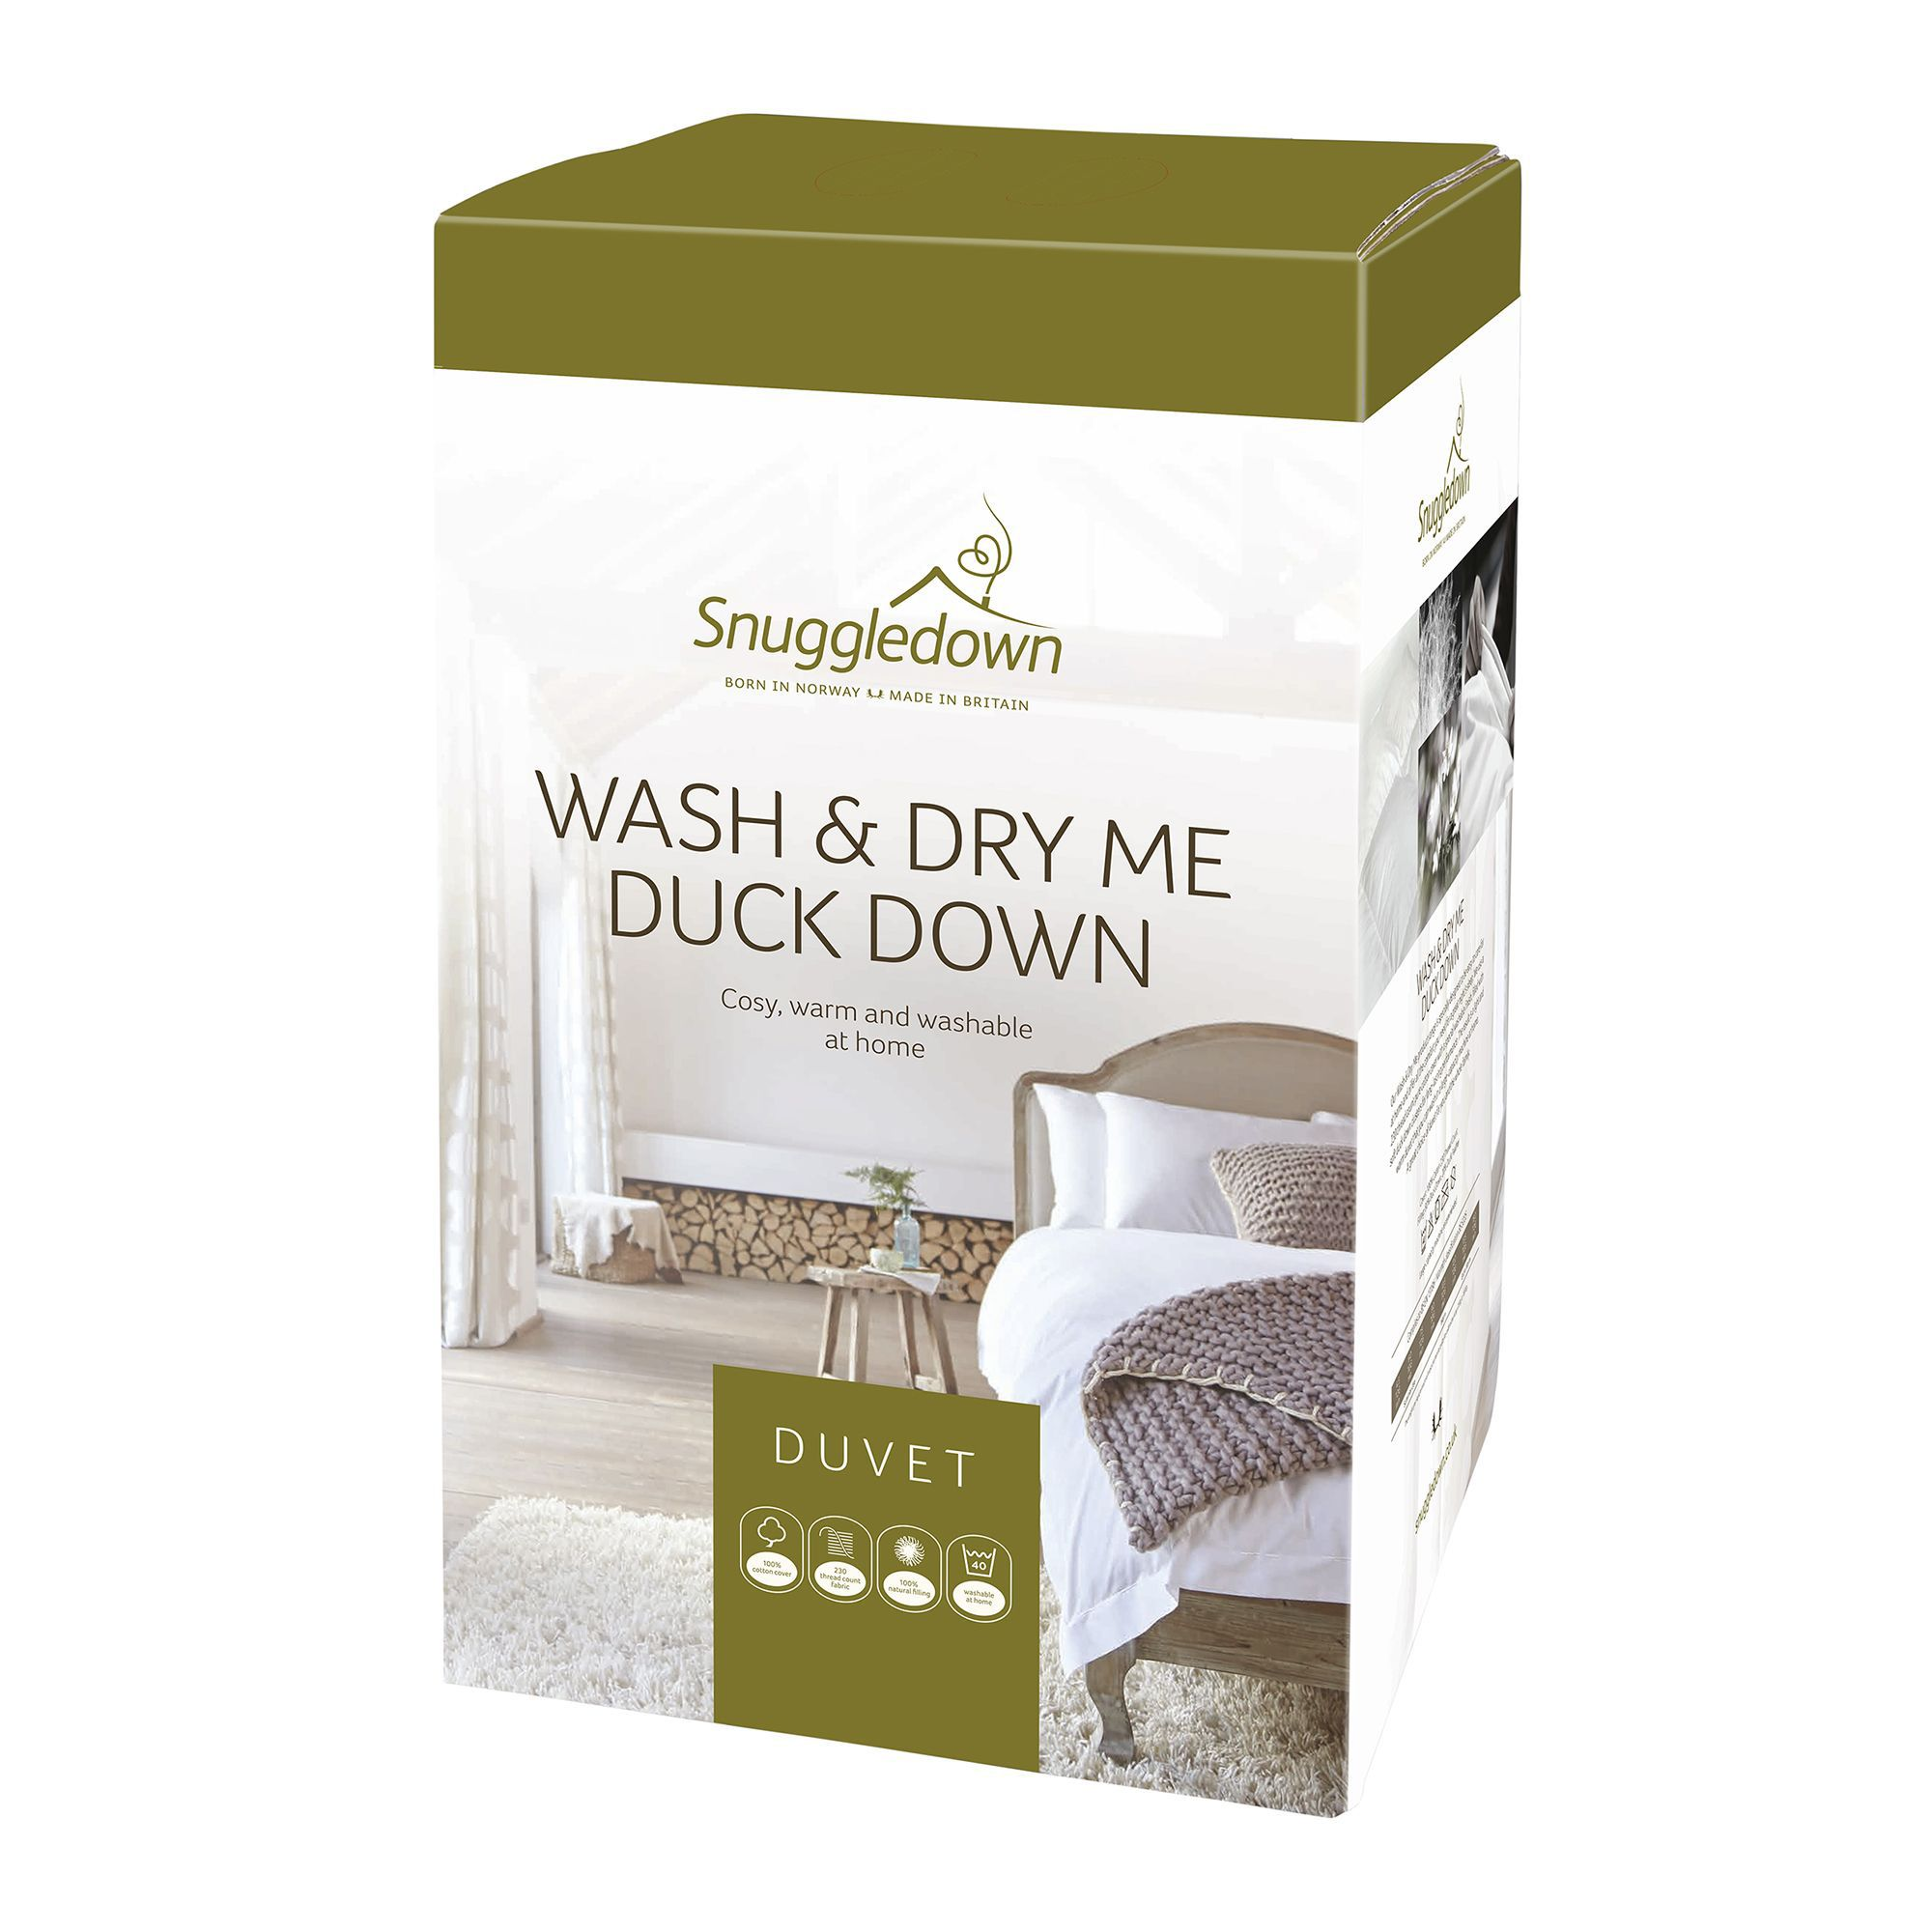 Snuggledown Wash Dry Me Duck Down Super King Duvet 135 Tog